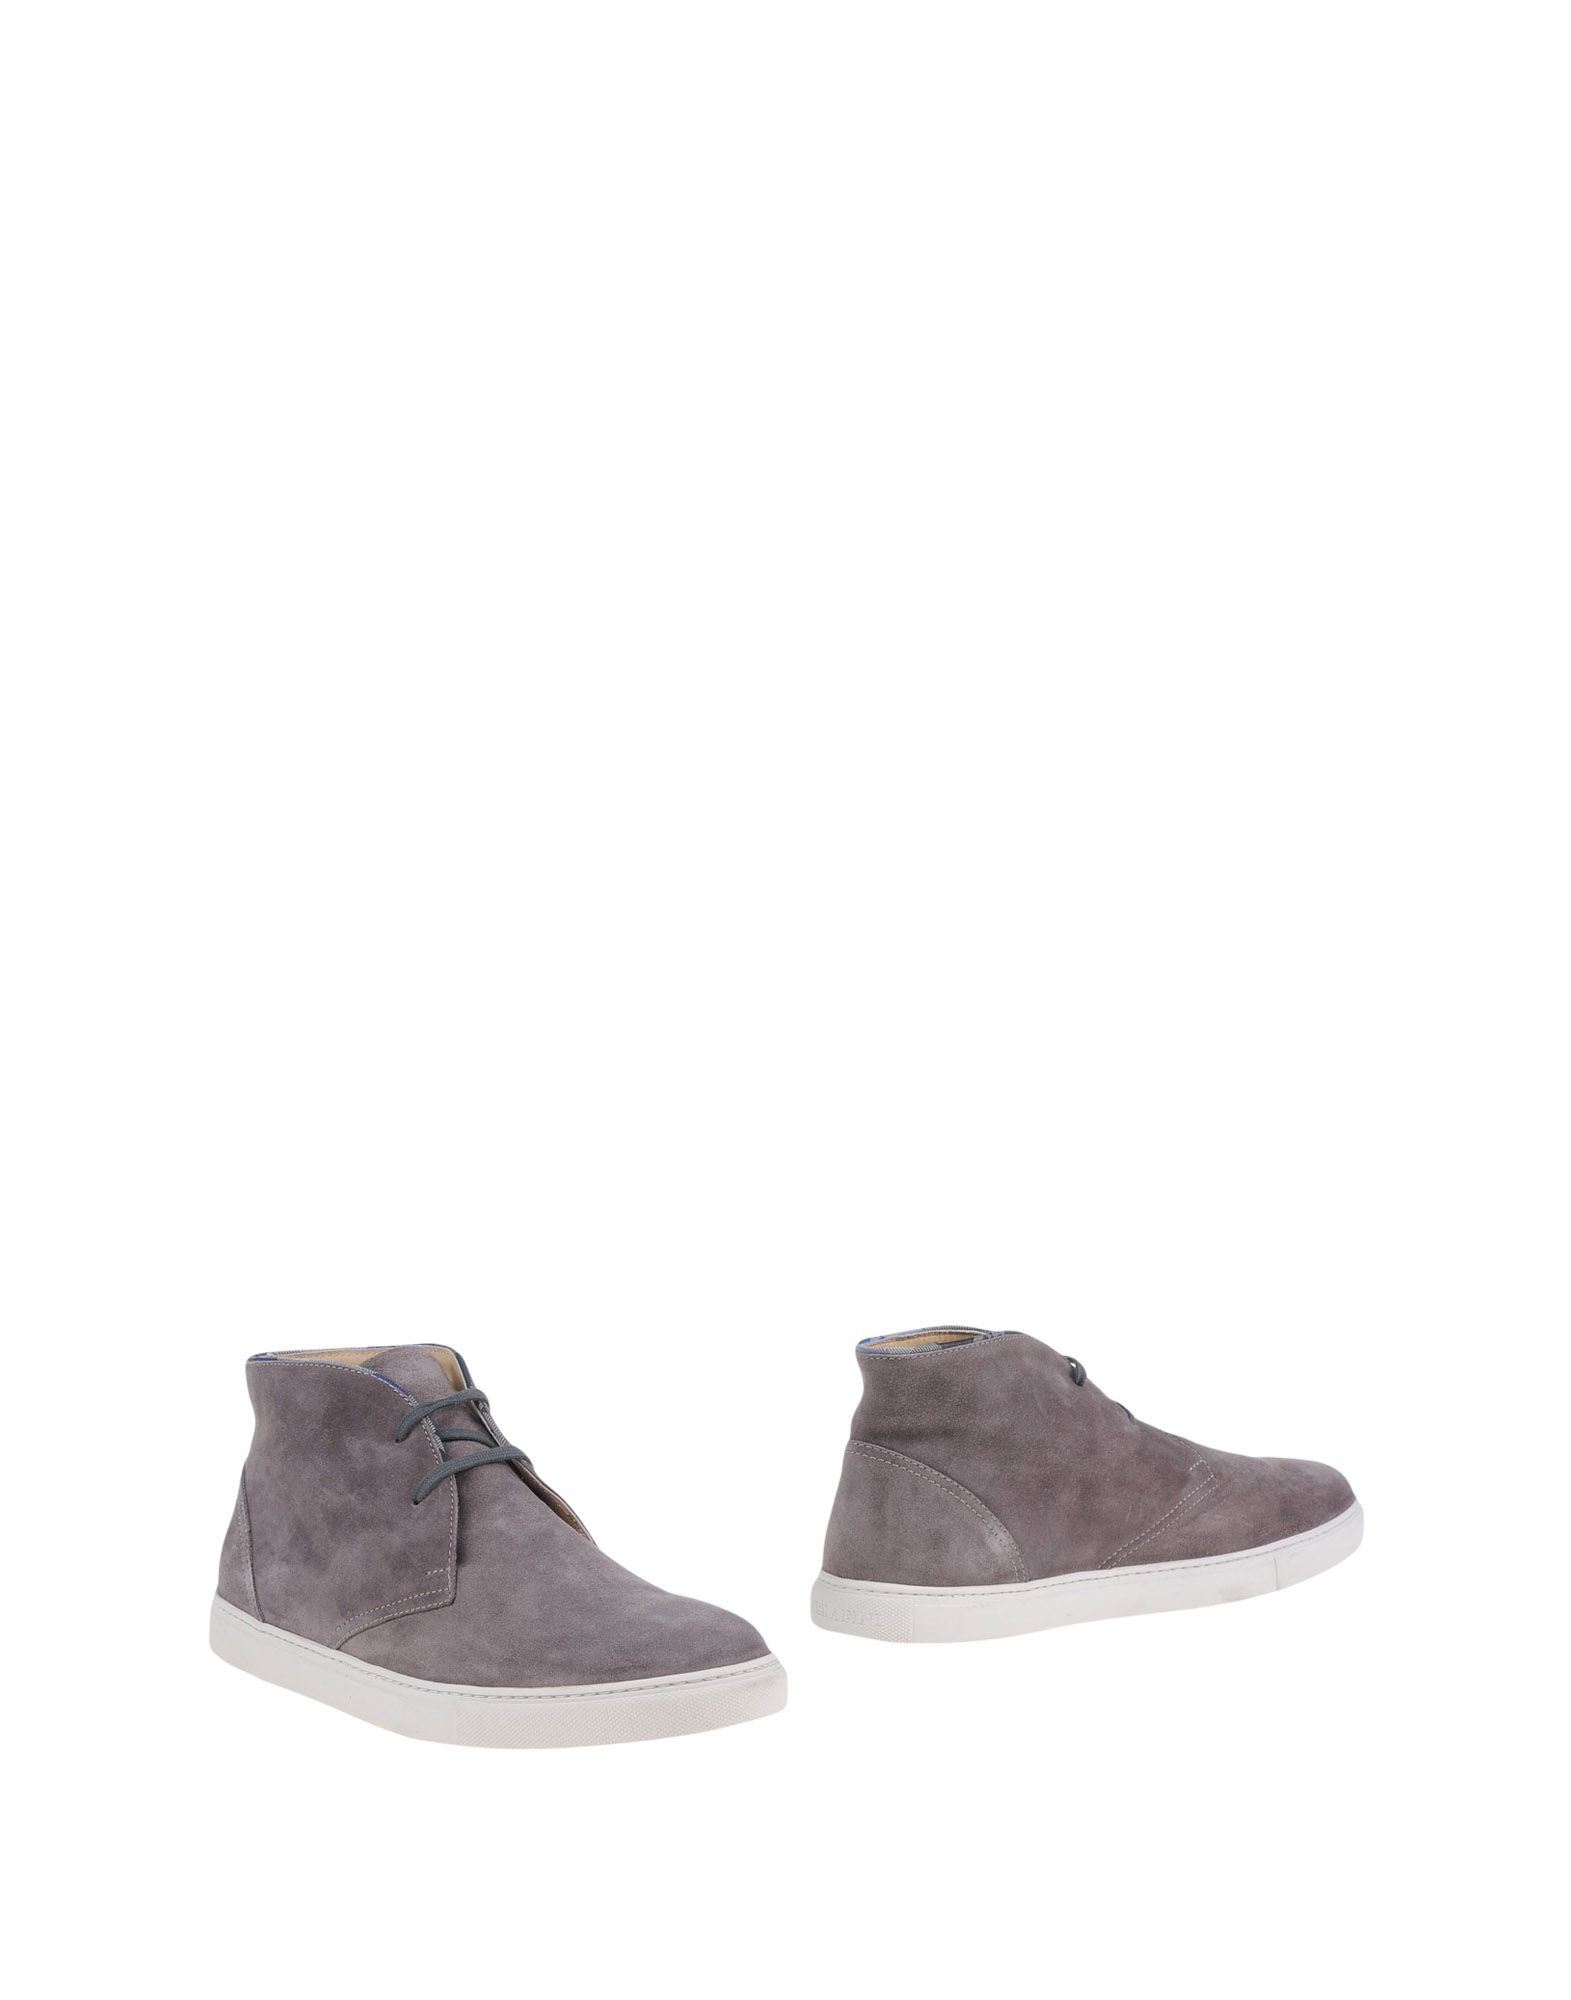 Rabatt echte Schuhe Serafini Times Stiefelette Herren  11043074LJ